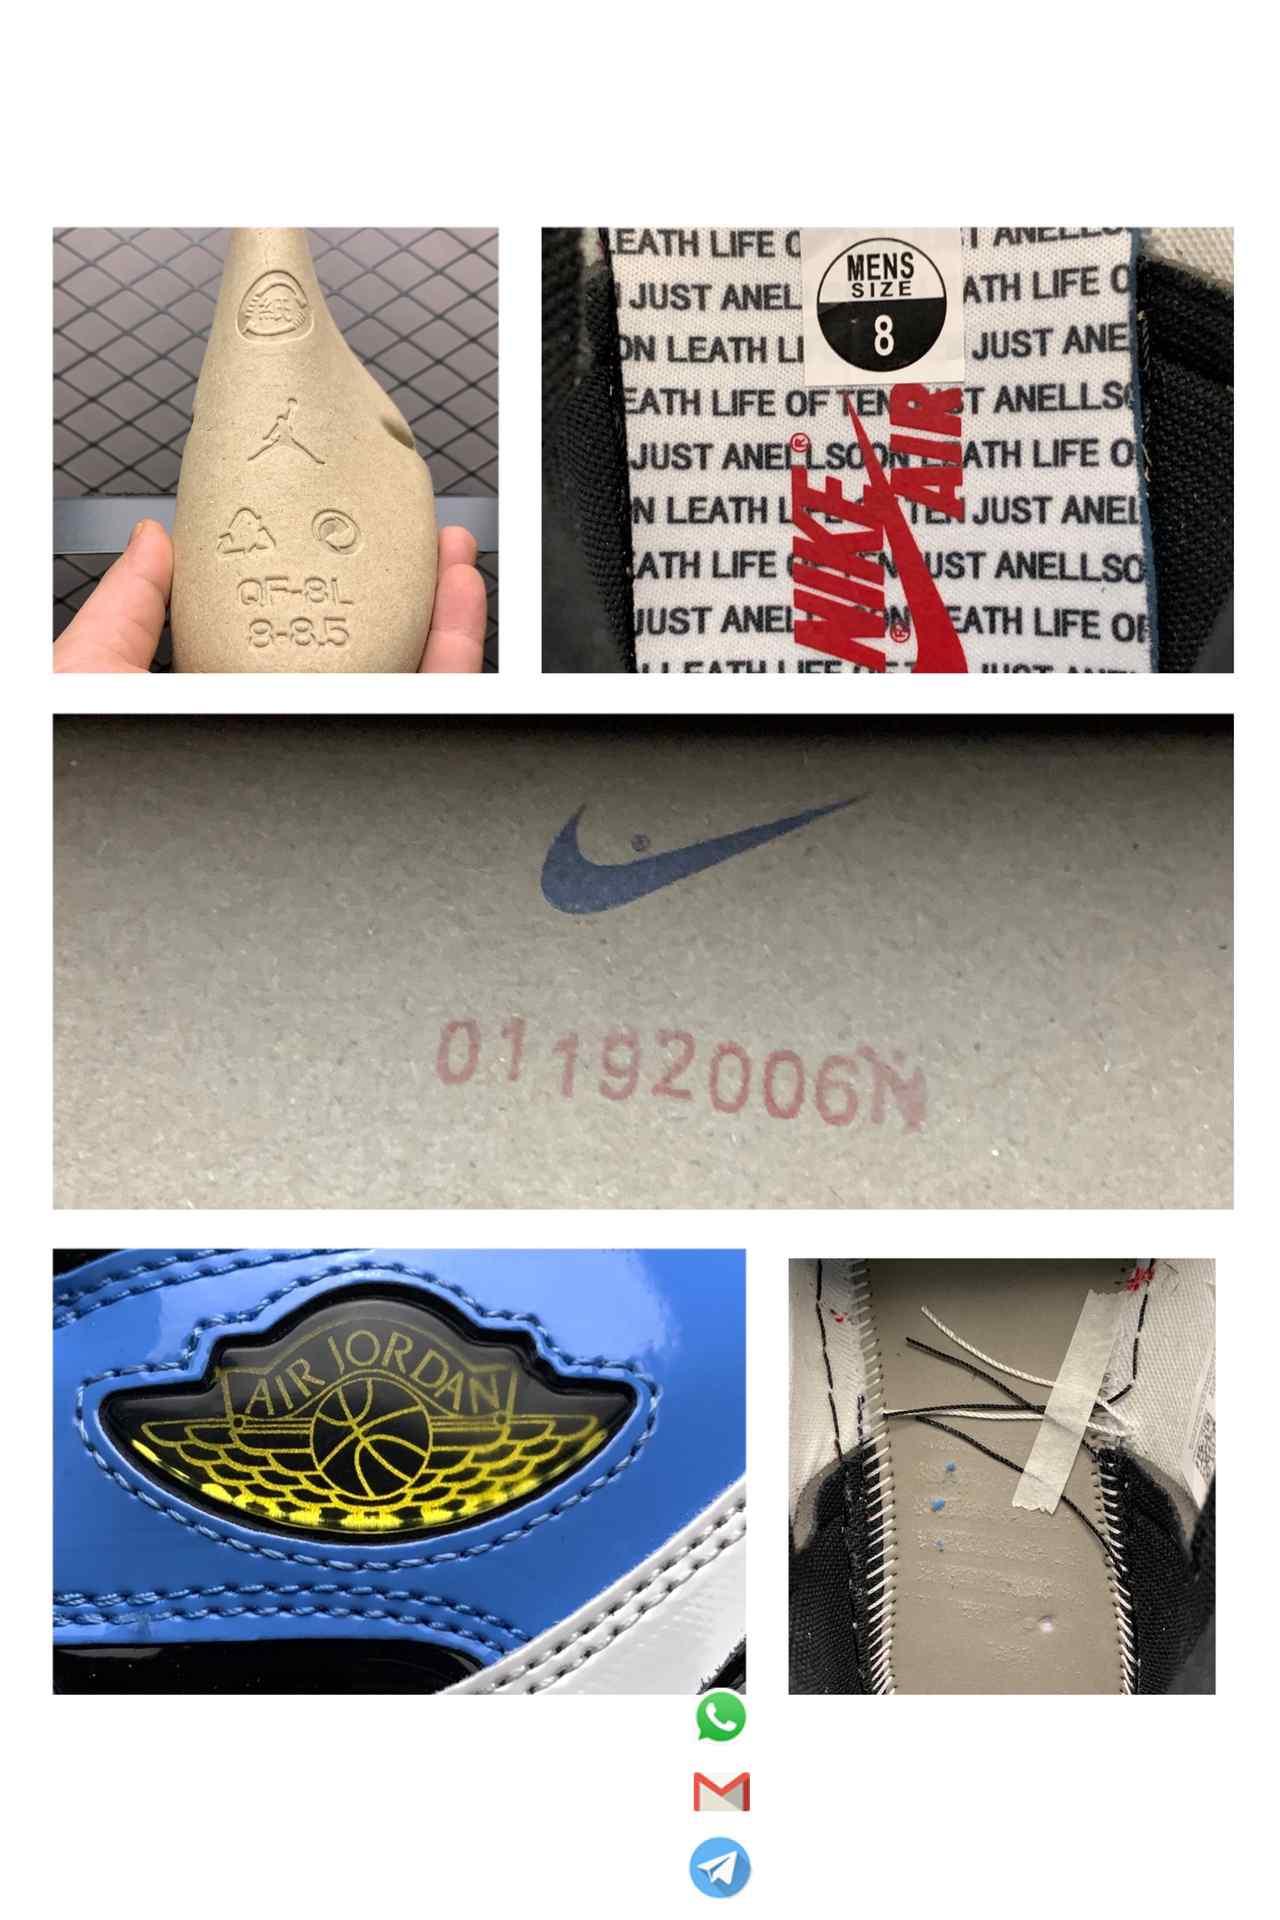 Best Replica Air Jordan 1 Retro High Fearless UNC Chicago SKU CK5666 100 Glossy Patent Leather Upper Metallic Gold Wings Logo 09